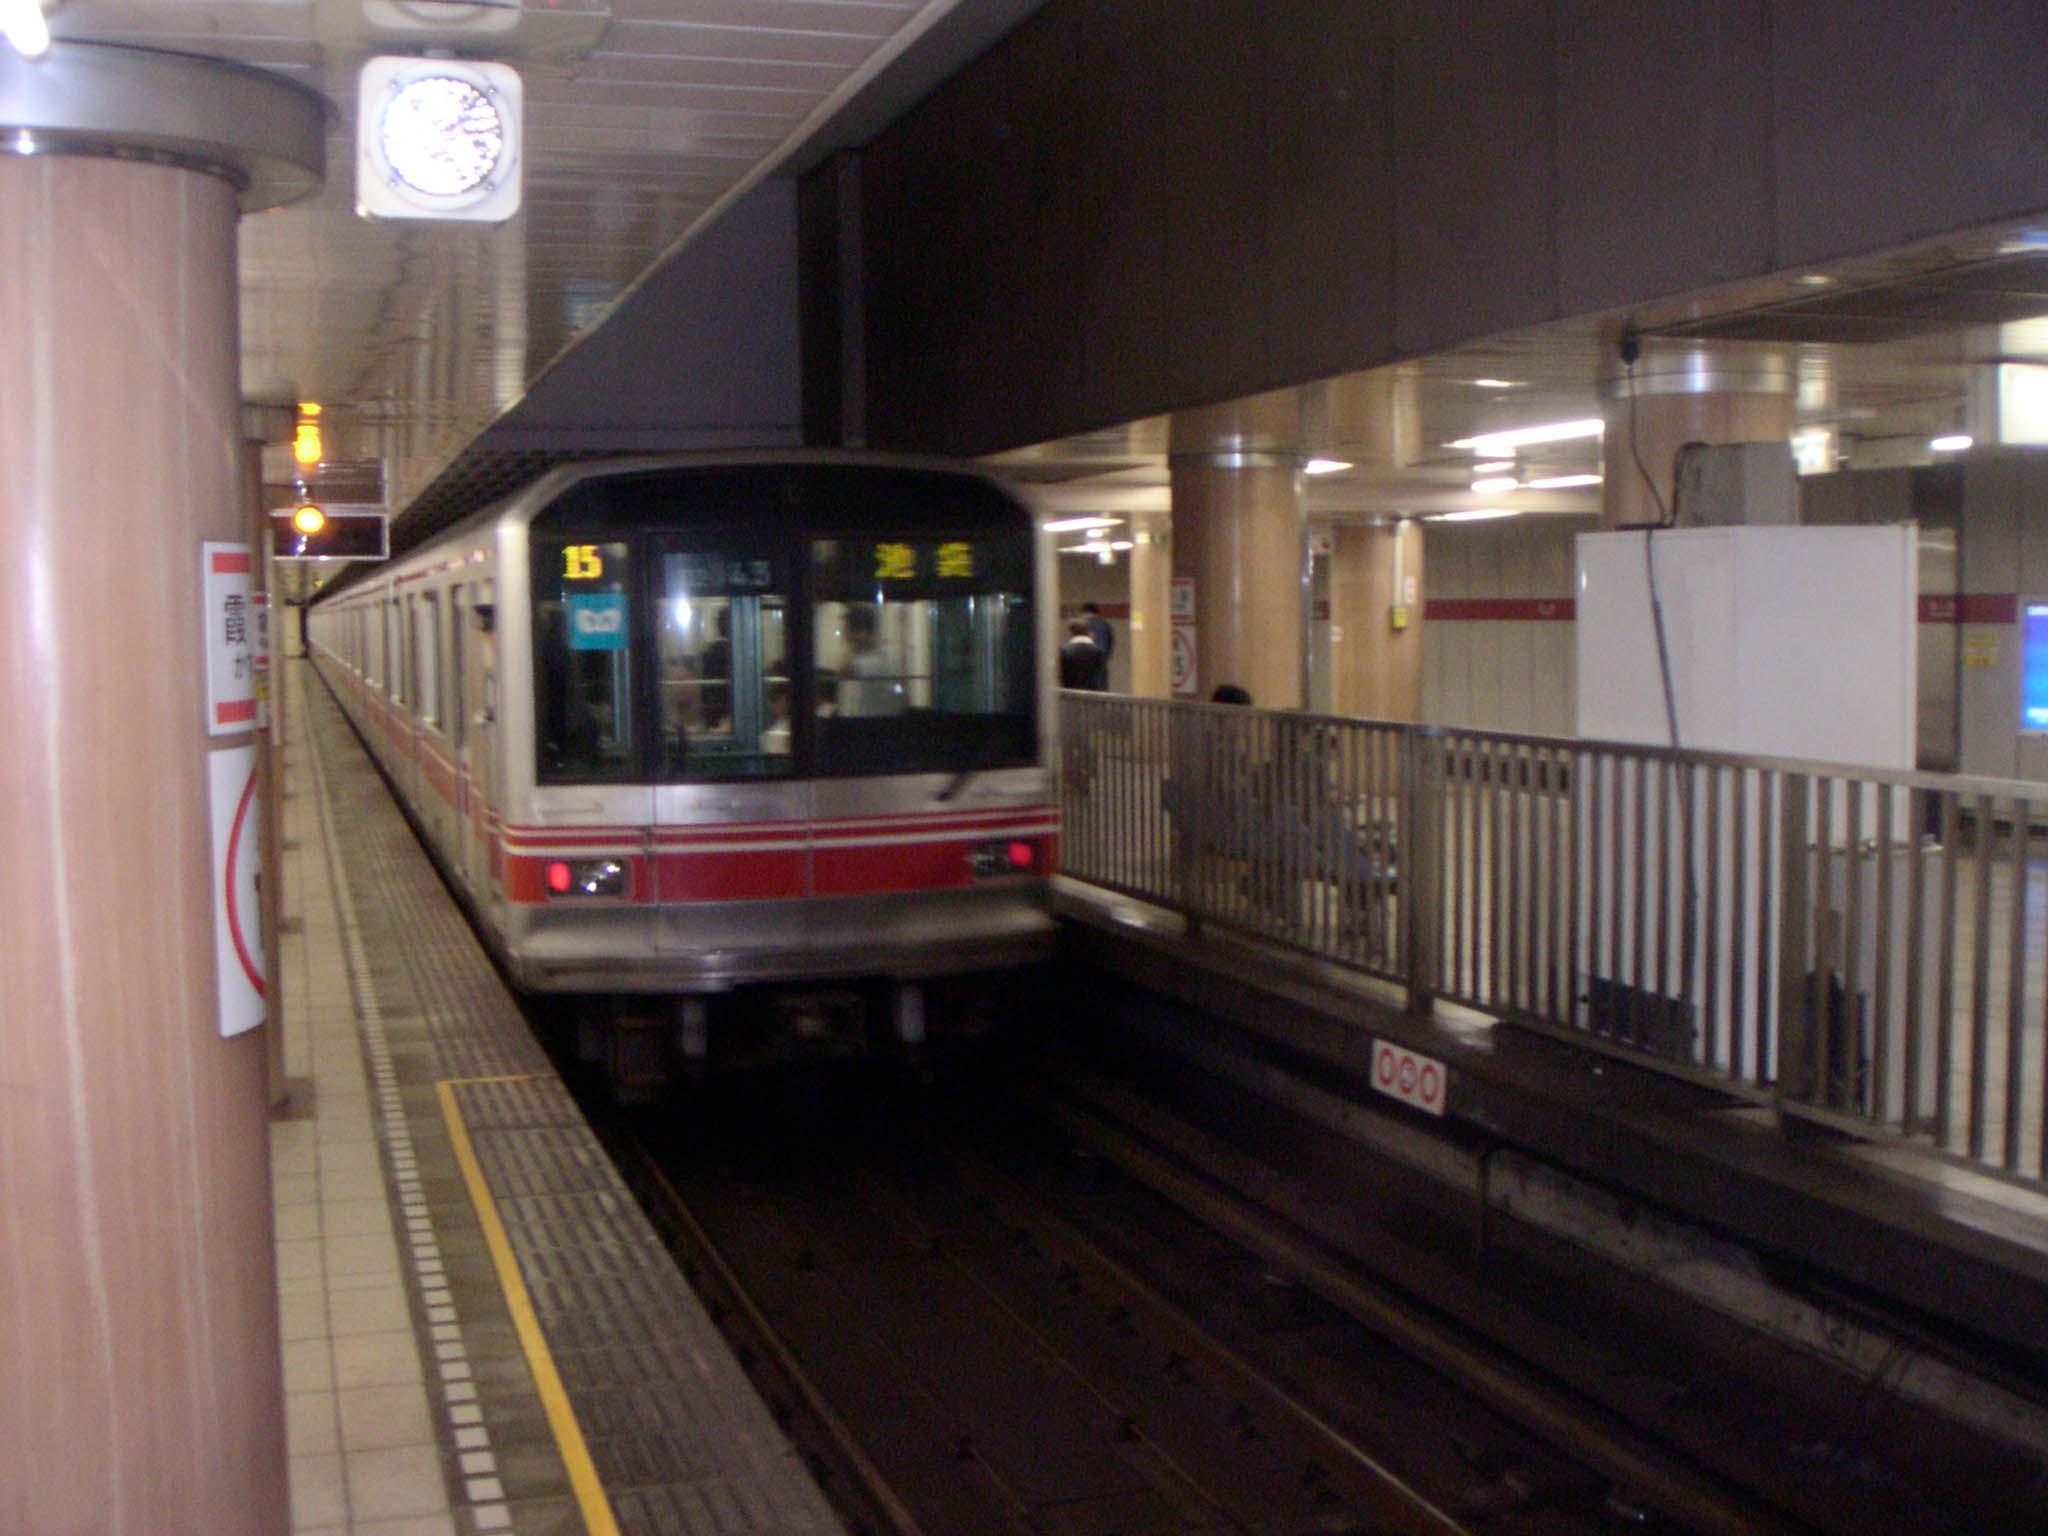 Doftattentat i tunnelbanan